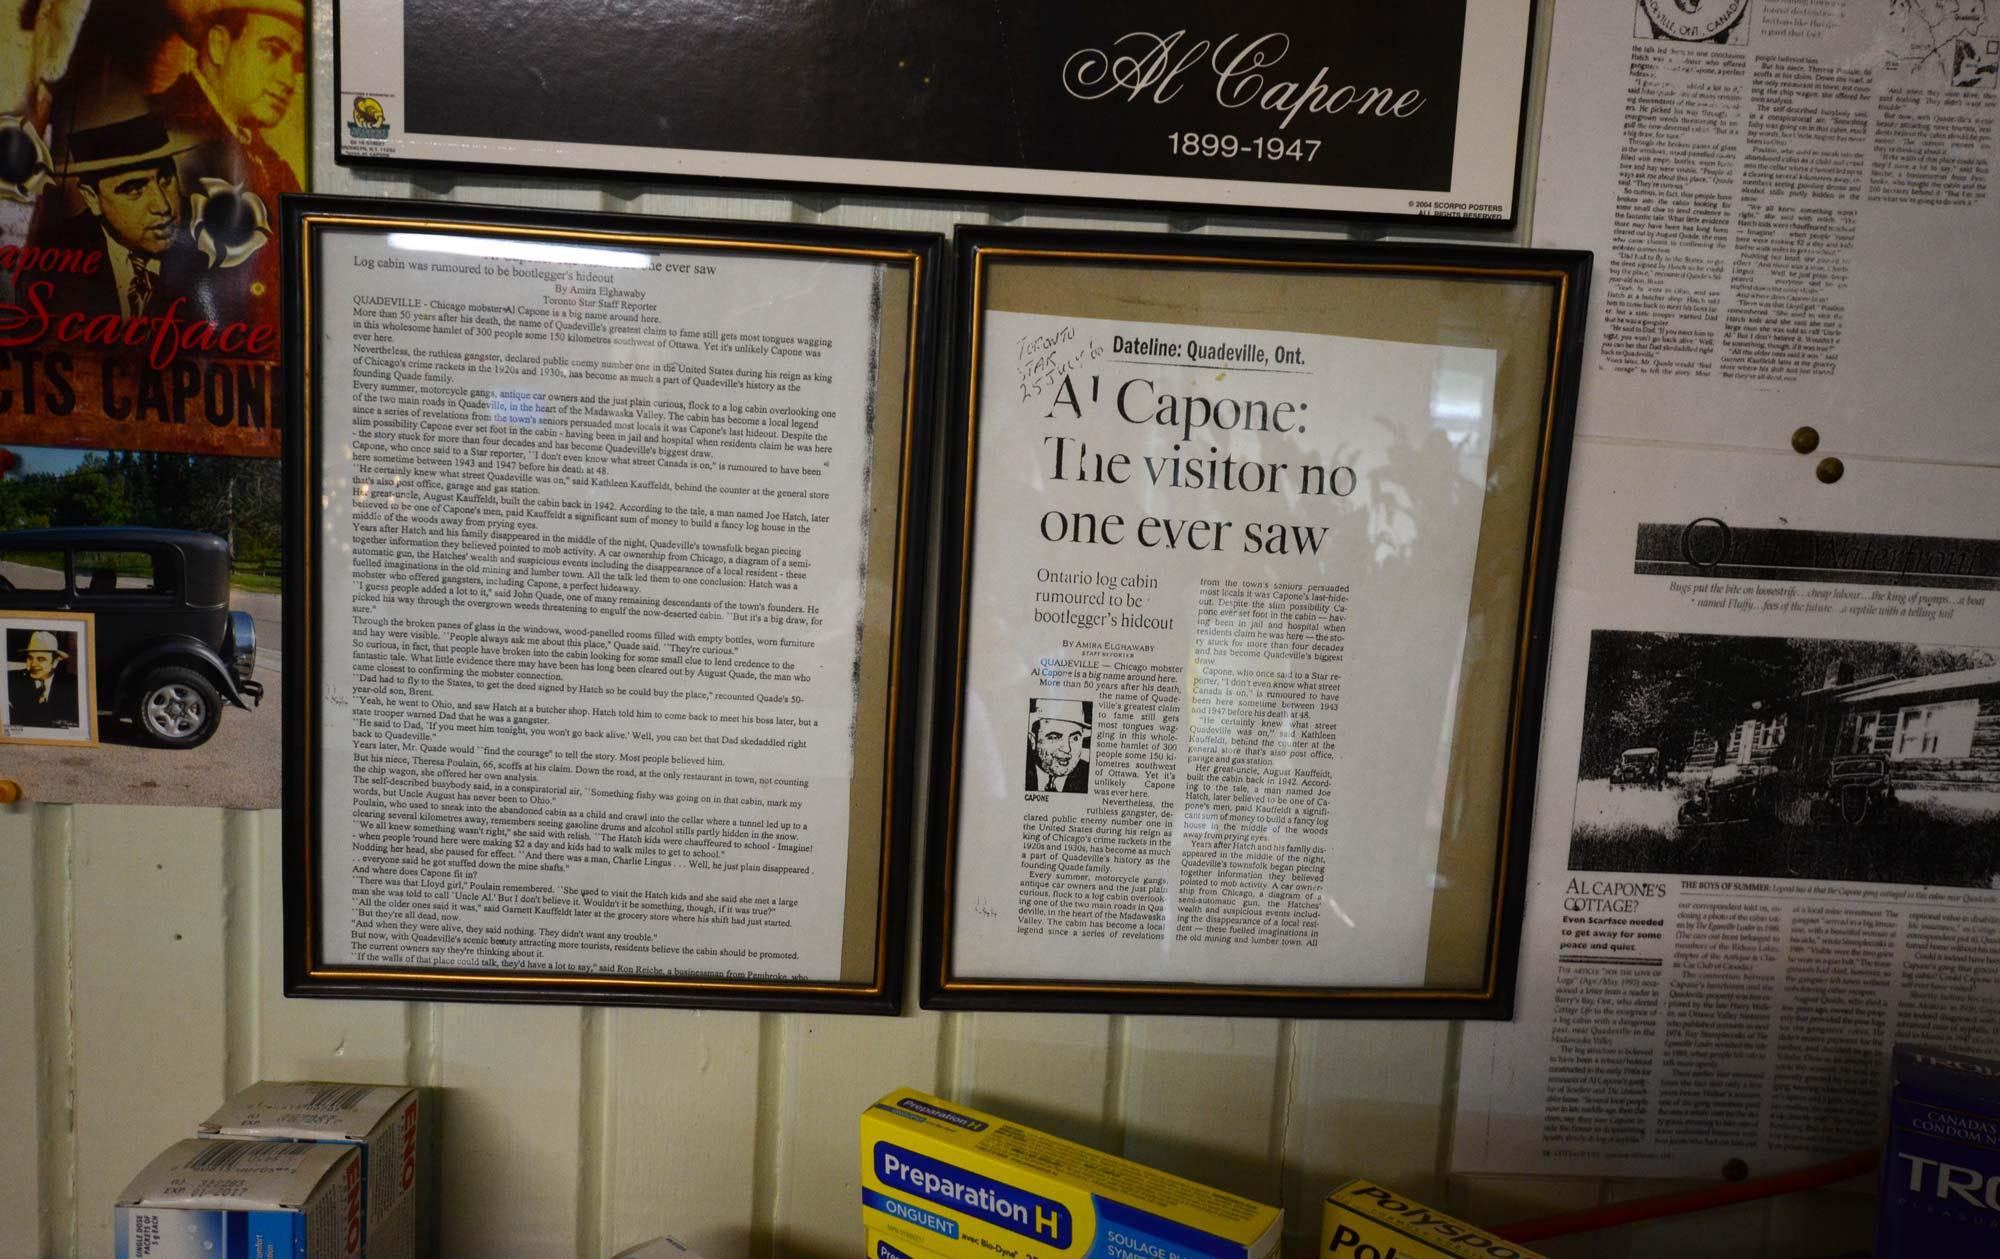 Al Capone at Kauffeldts Grocery in Quadeville